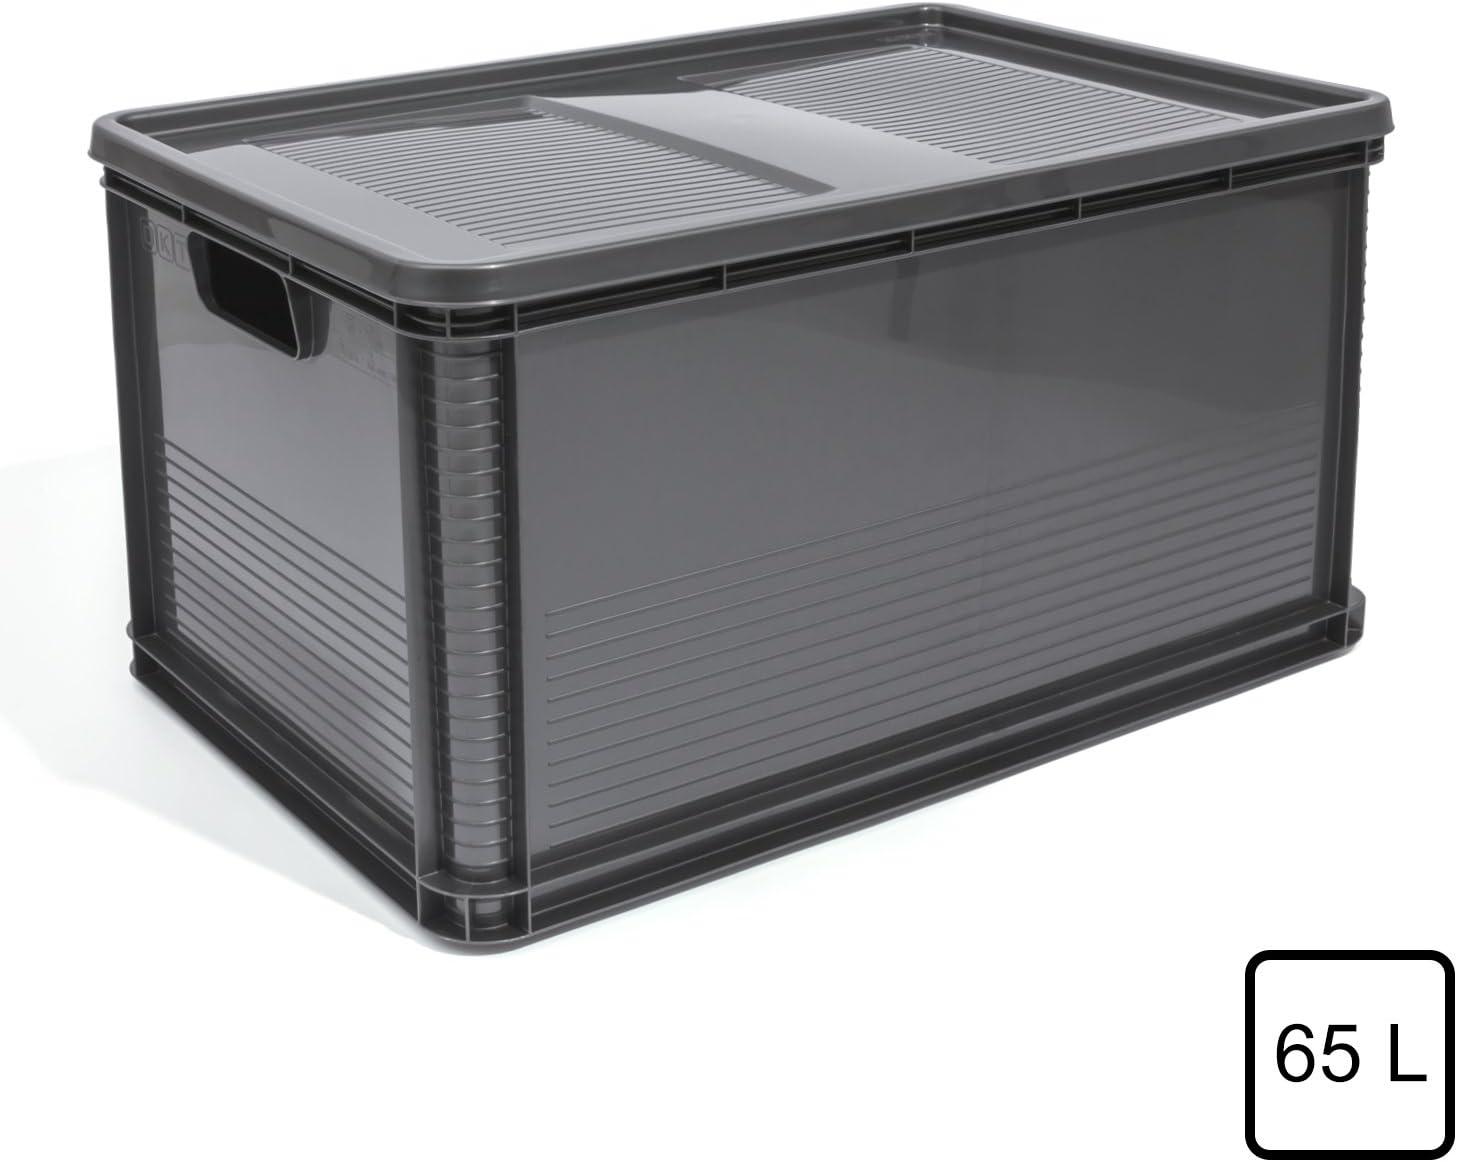 3 Stück E3-Kiste Stapelbox Kunststoffbehälter Eurokiste Eurobox Lagerbox grau.